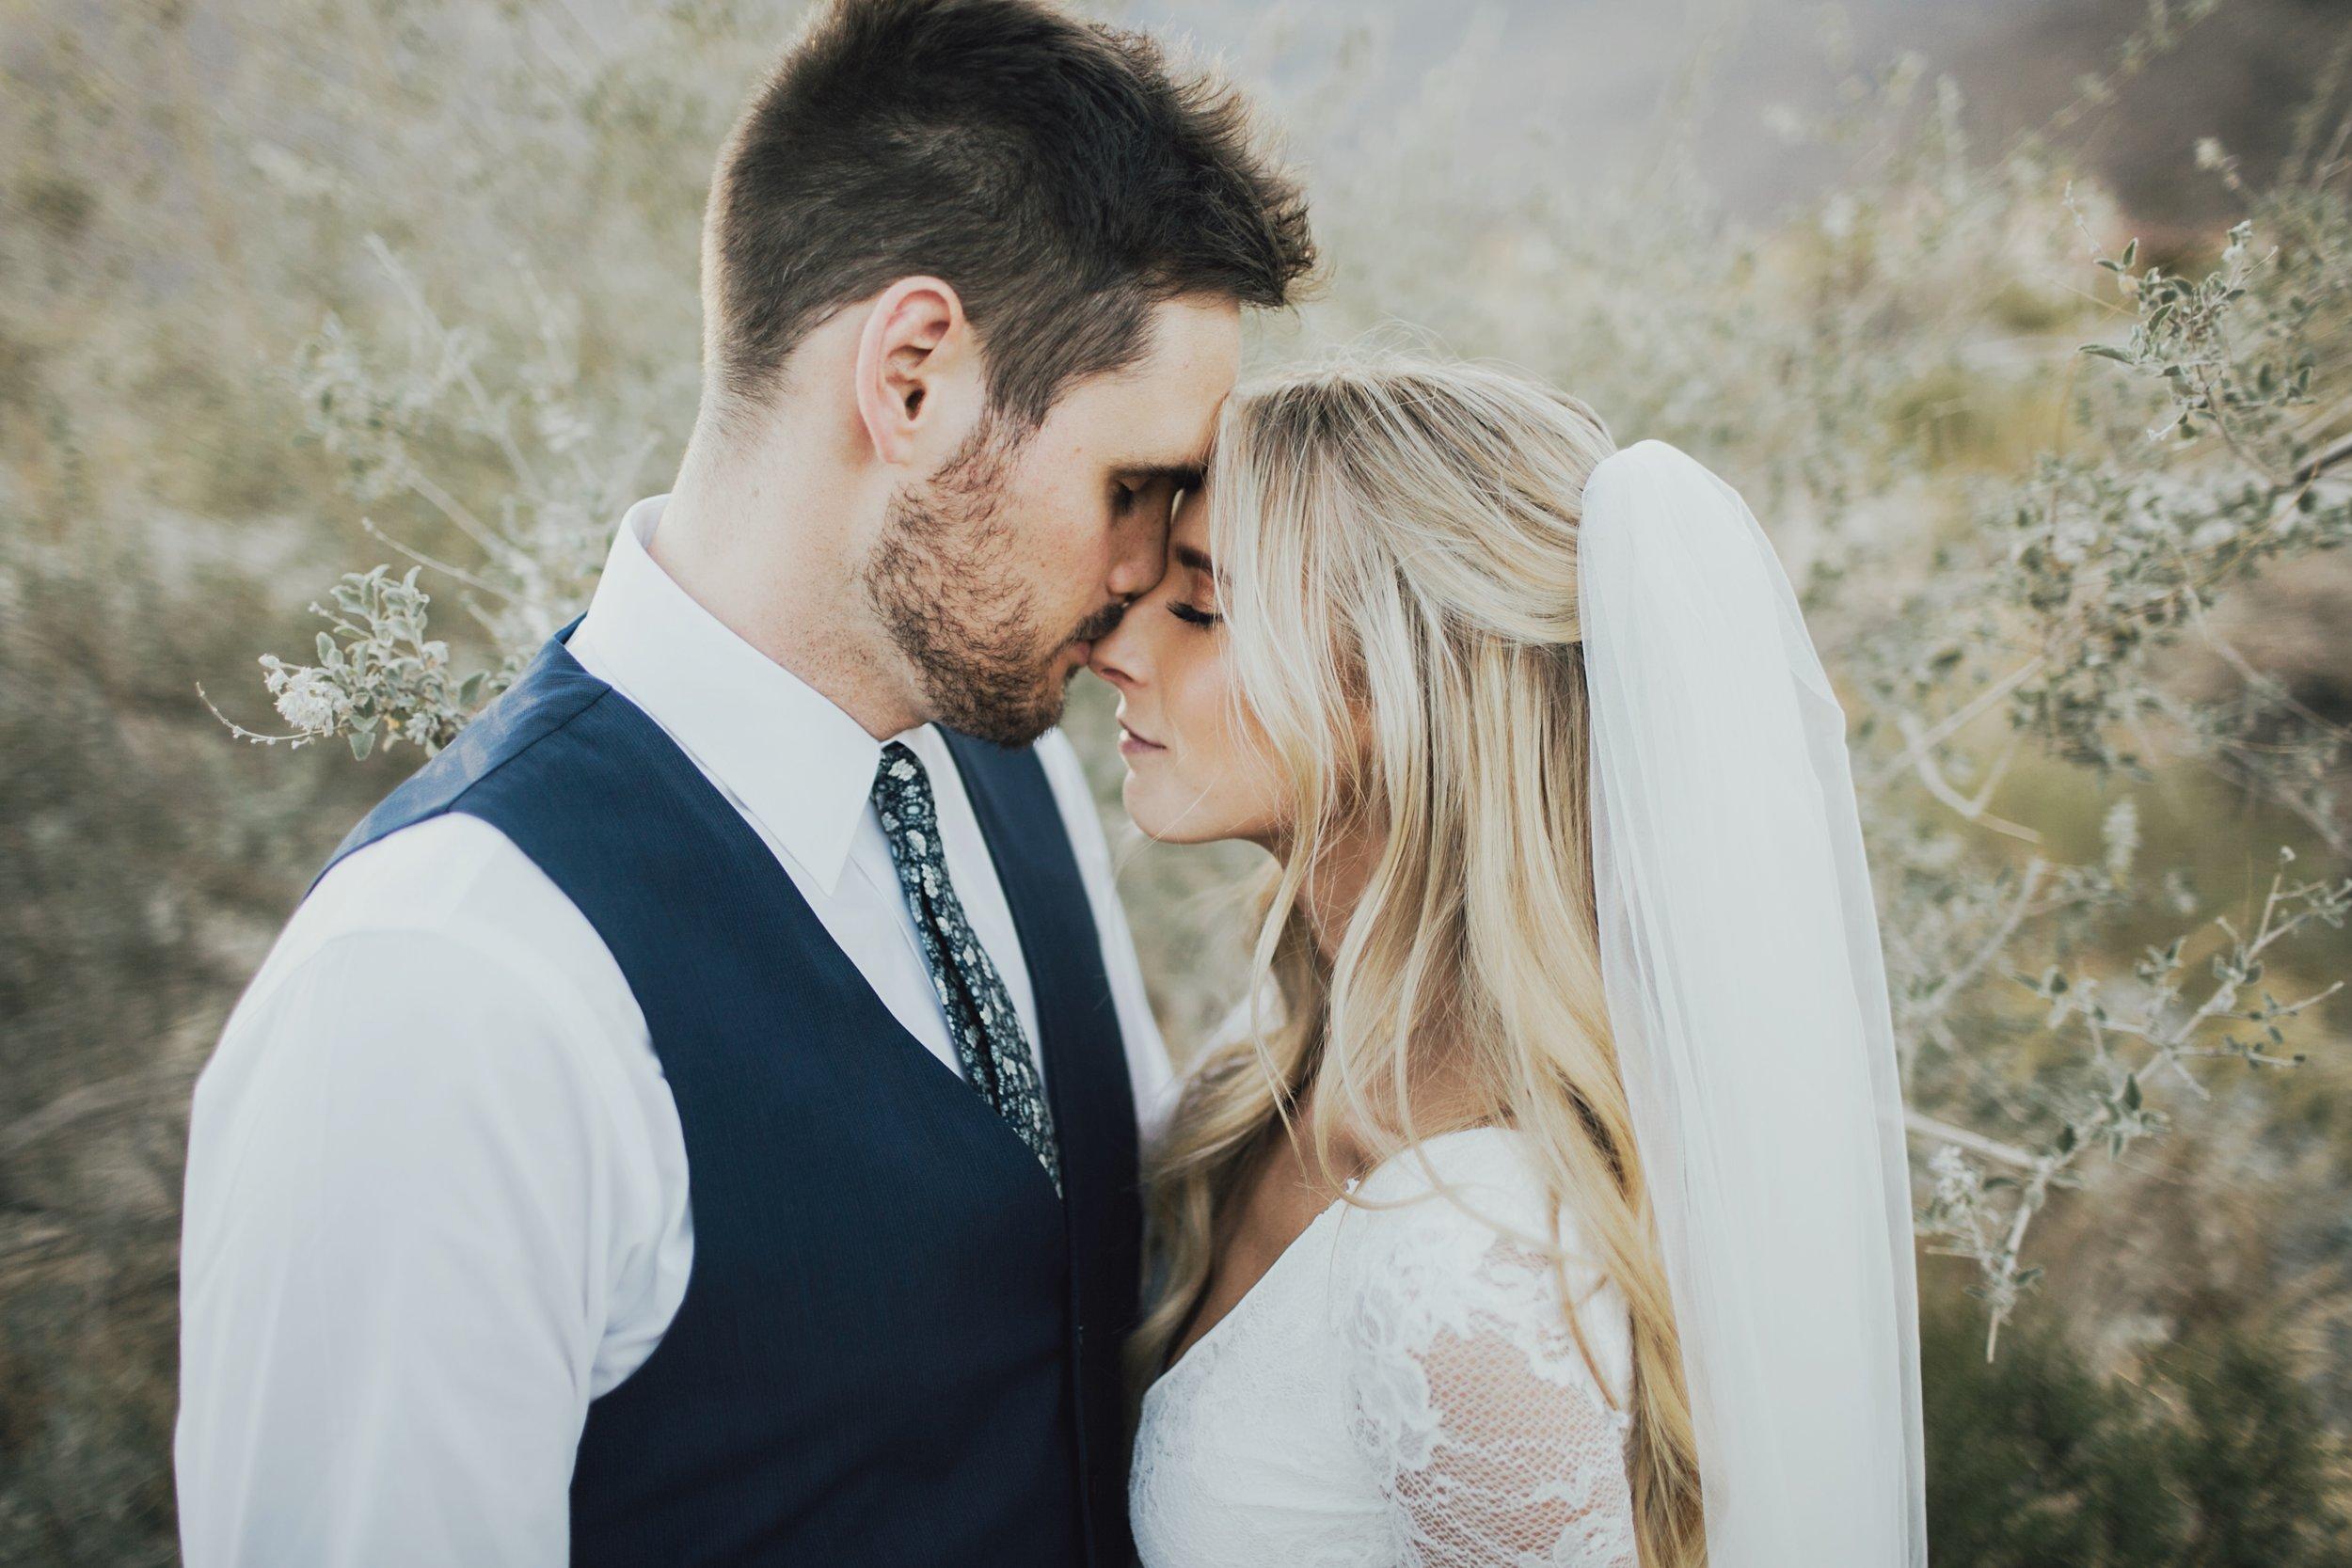 desert wedding photography romantic photographs